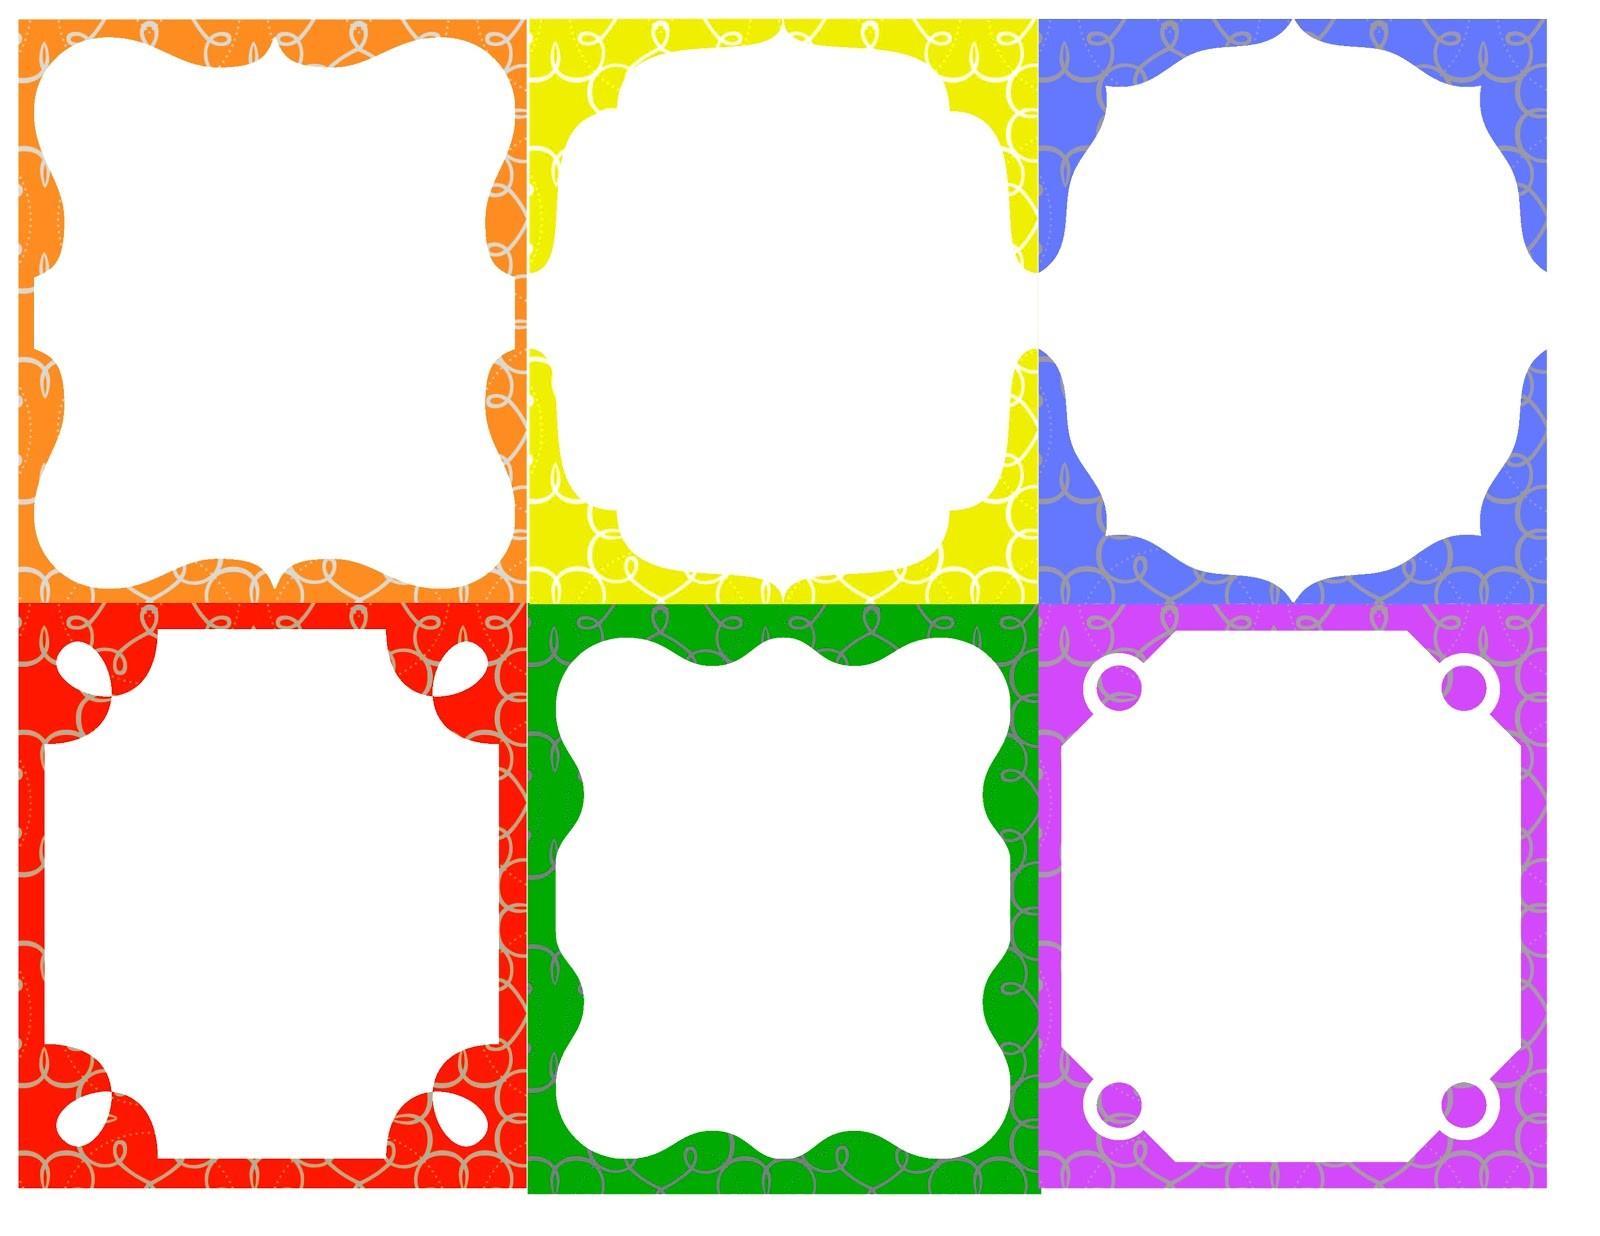 Free clipart name tags image free Free Name Tag Cliparts, Download Free Clip Art, Free Clip Art on ... image free